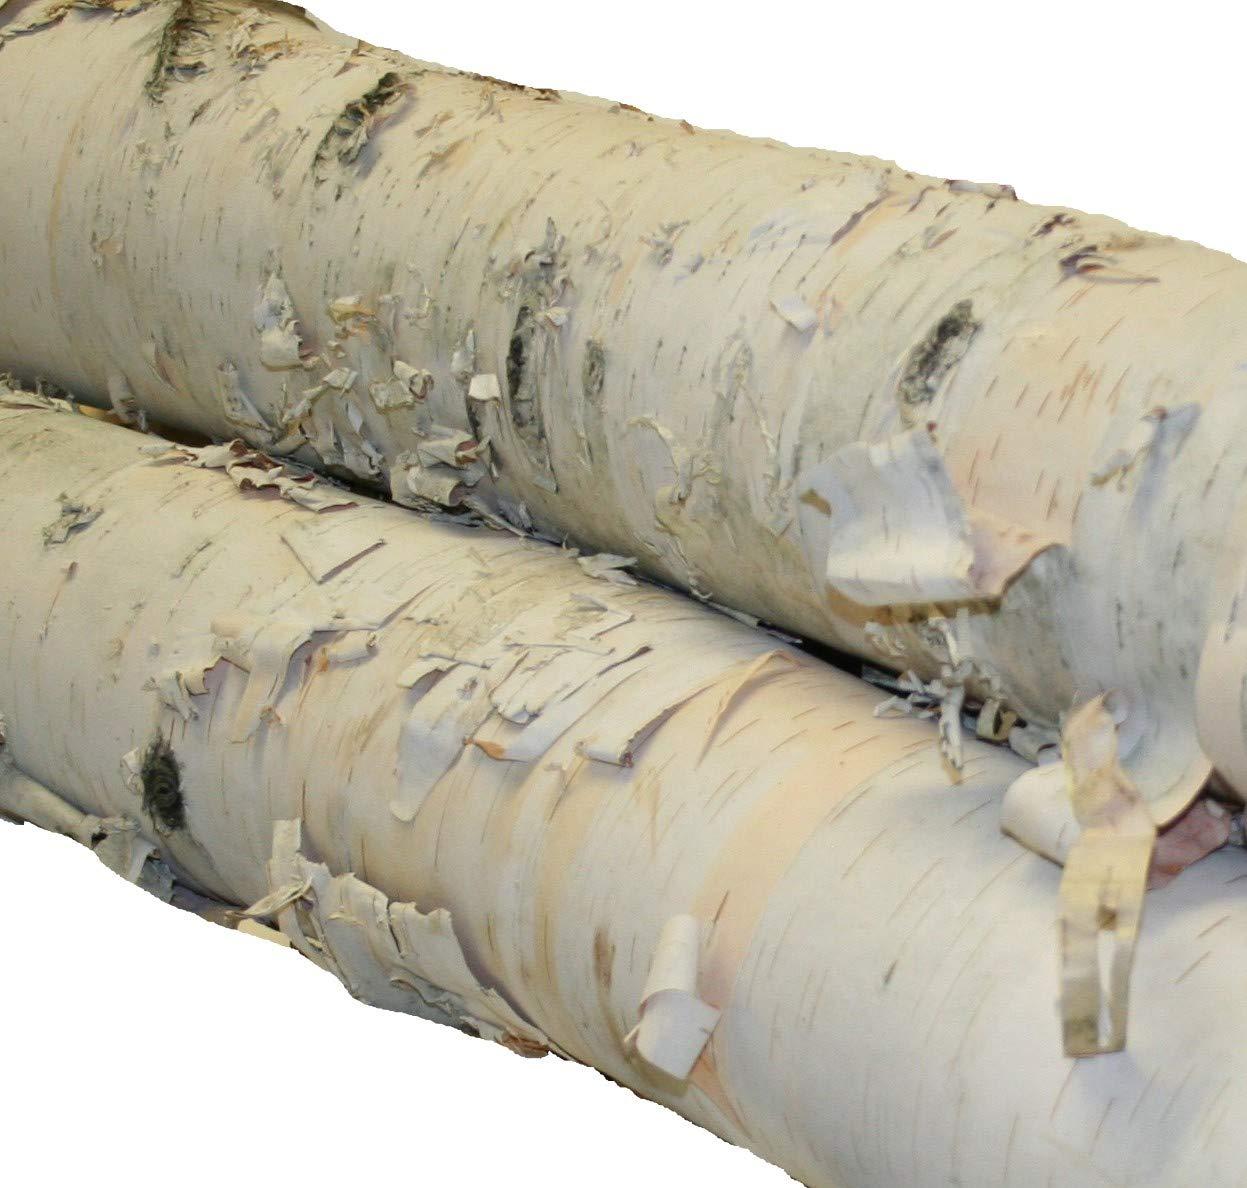 Fireplace Set of White Birch Logs by Wilson Enterprises